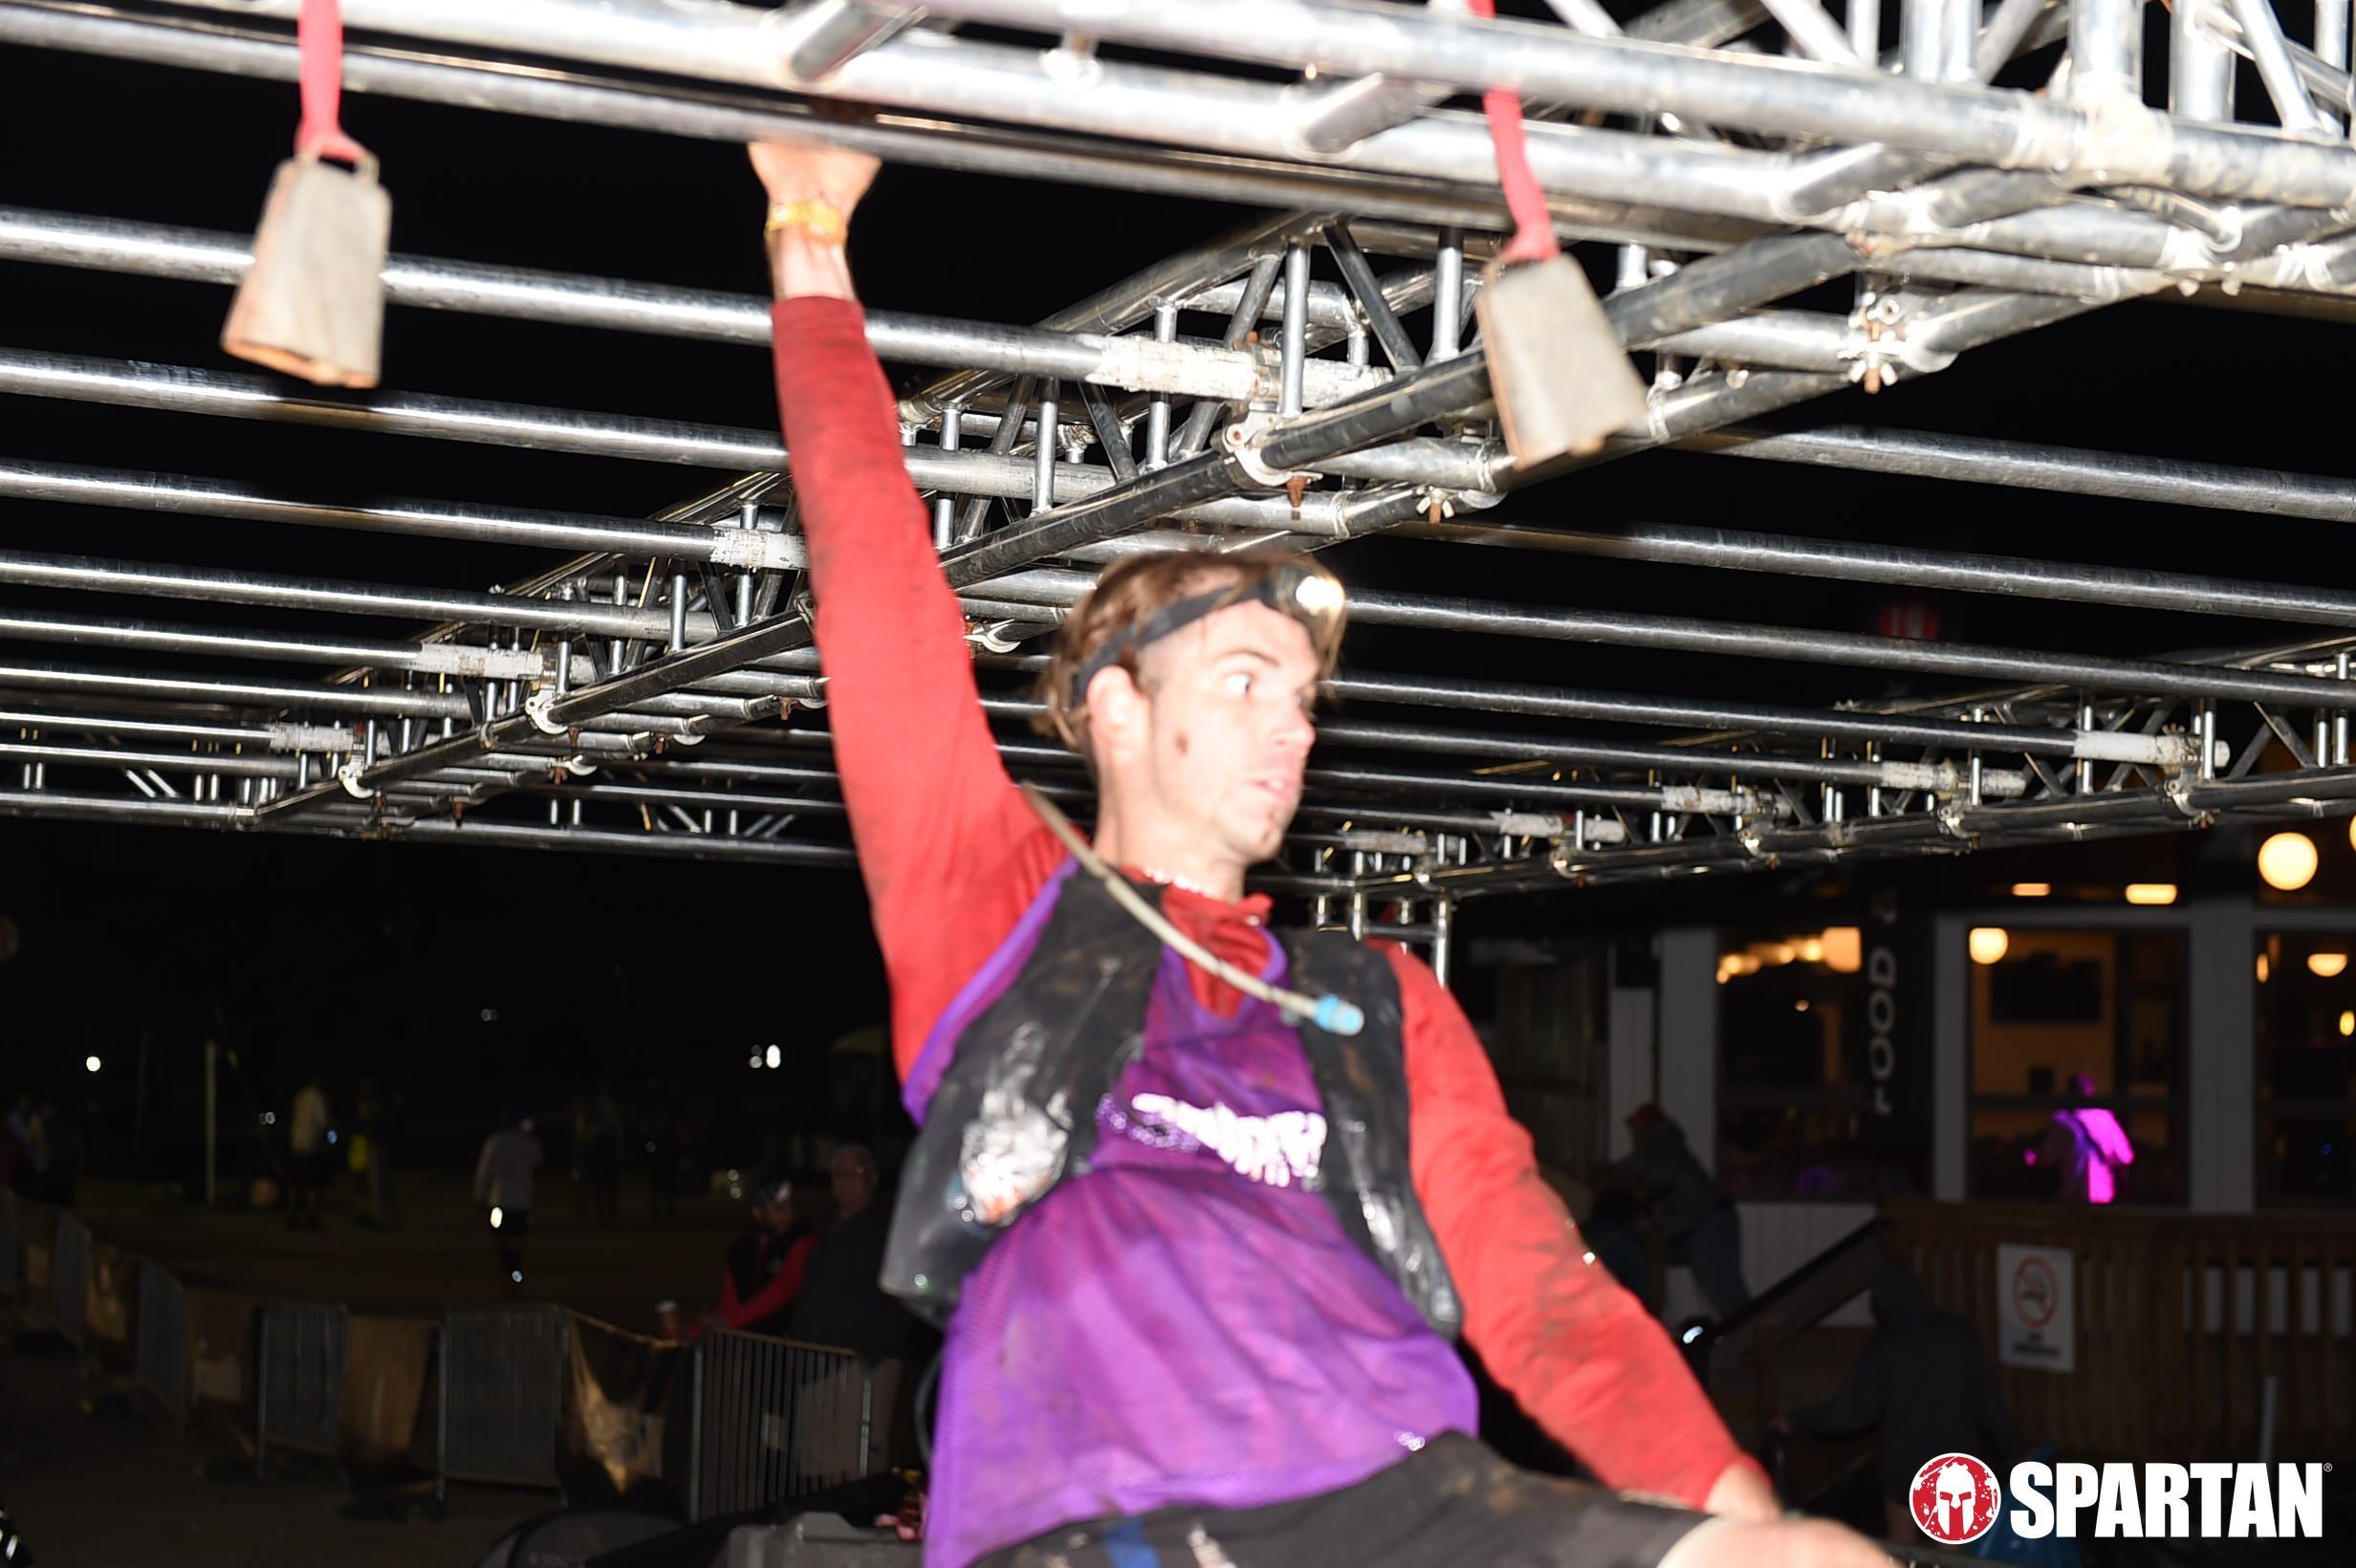 man with headlamp swings on monkey bars